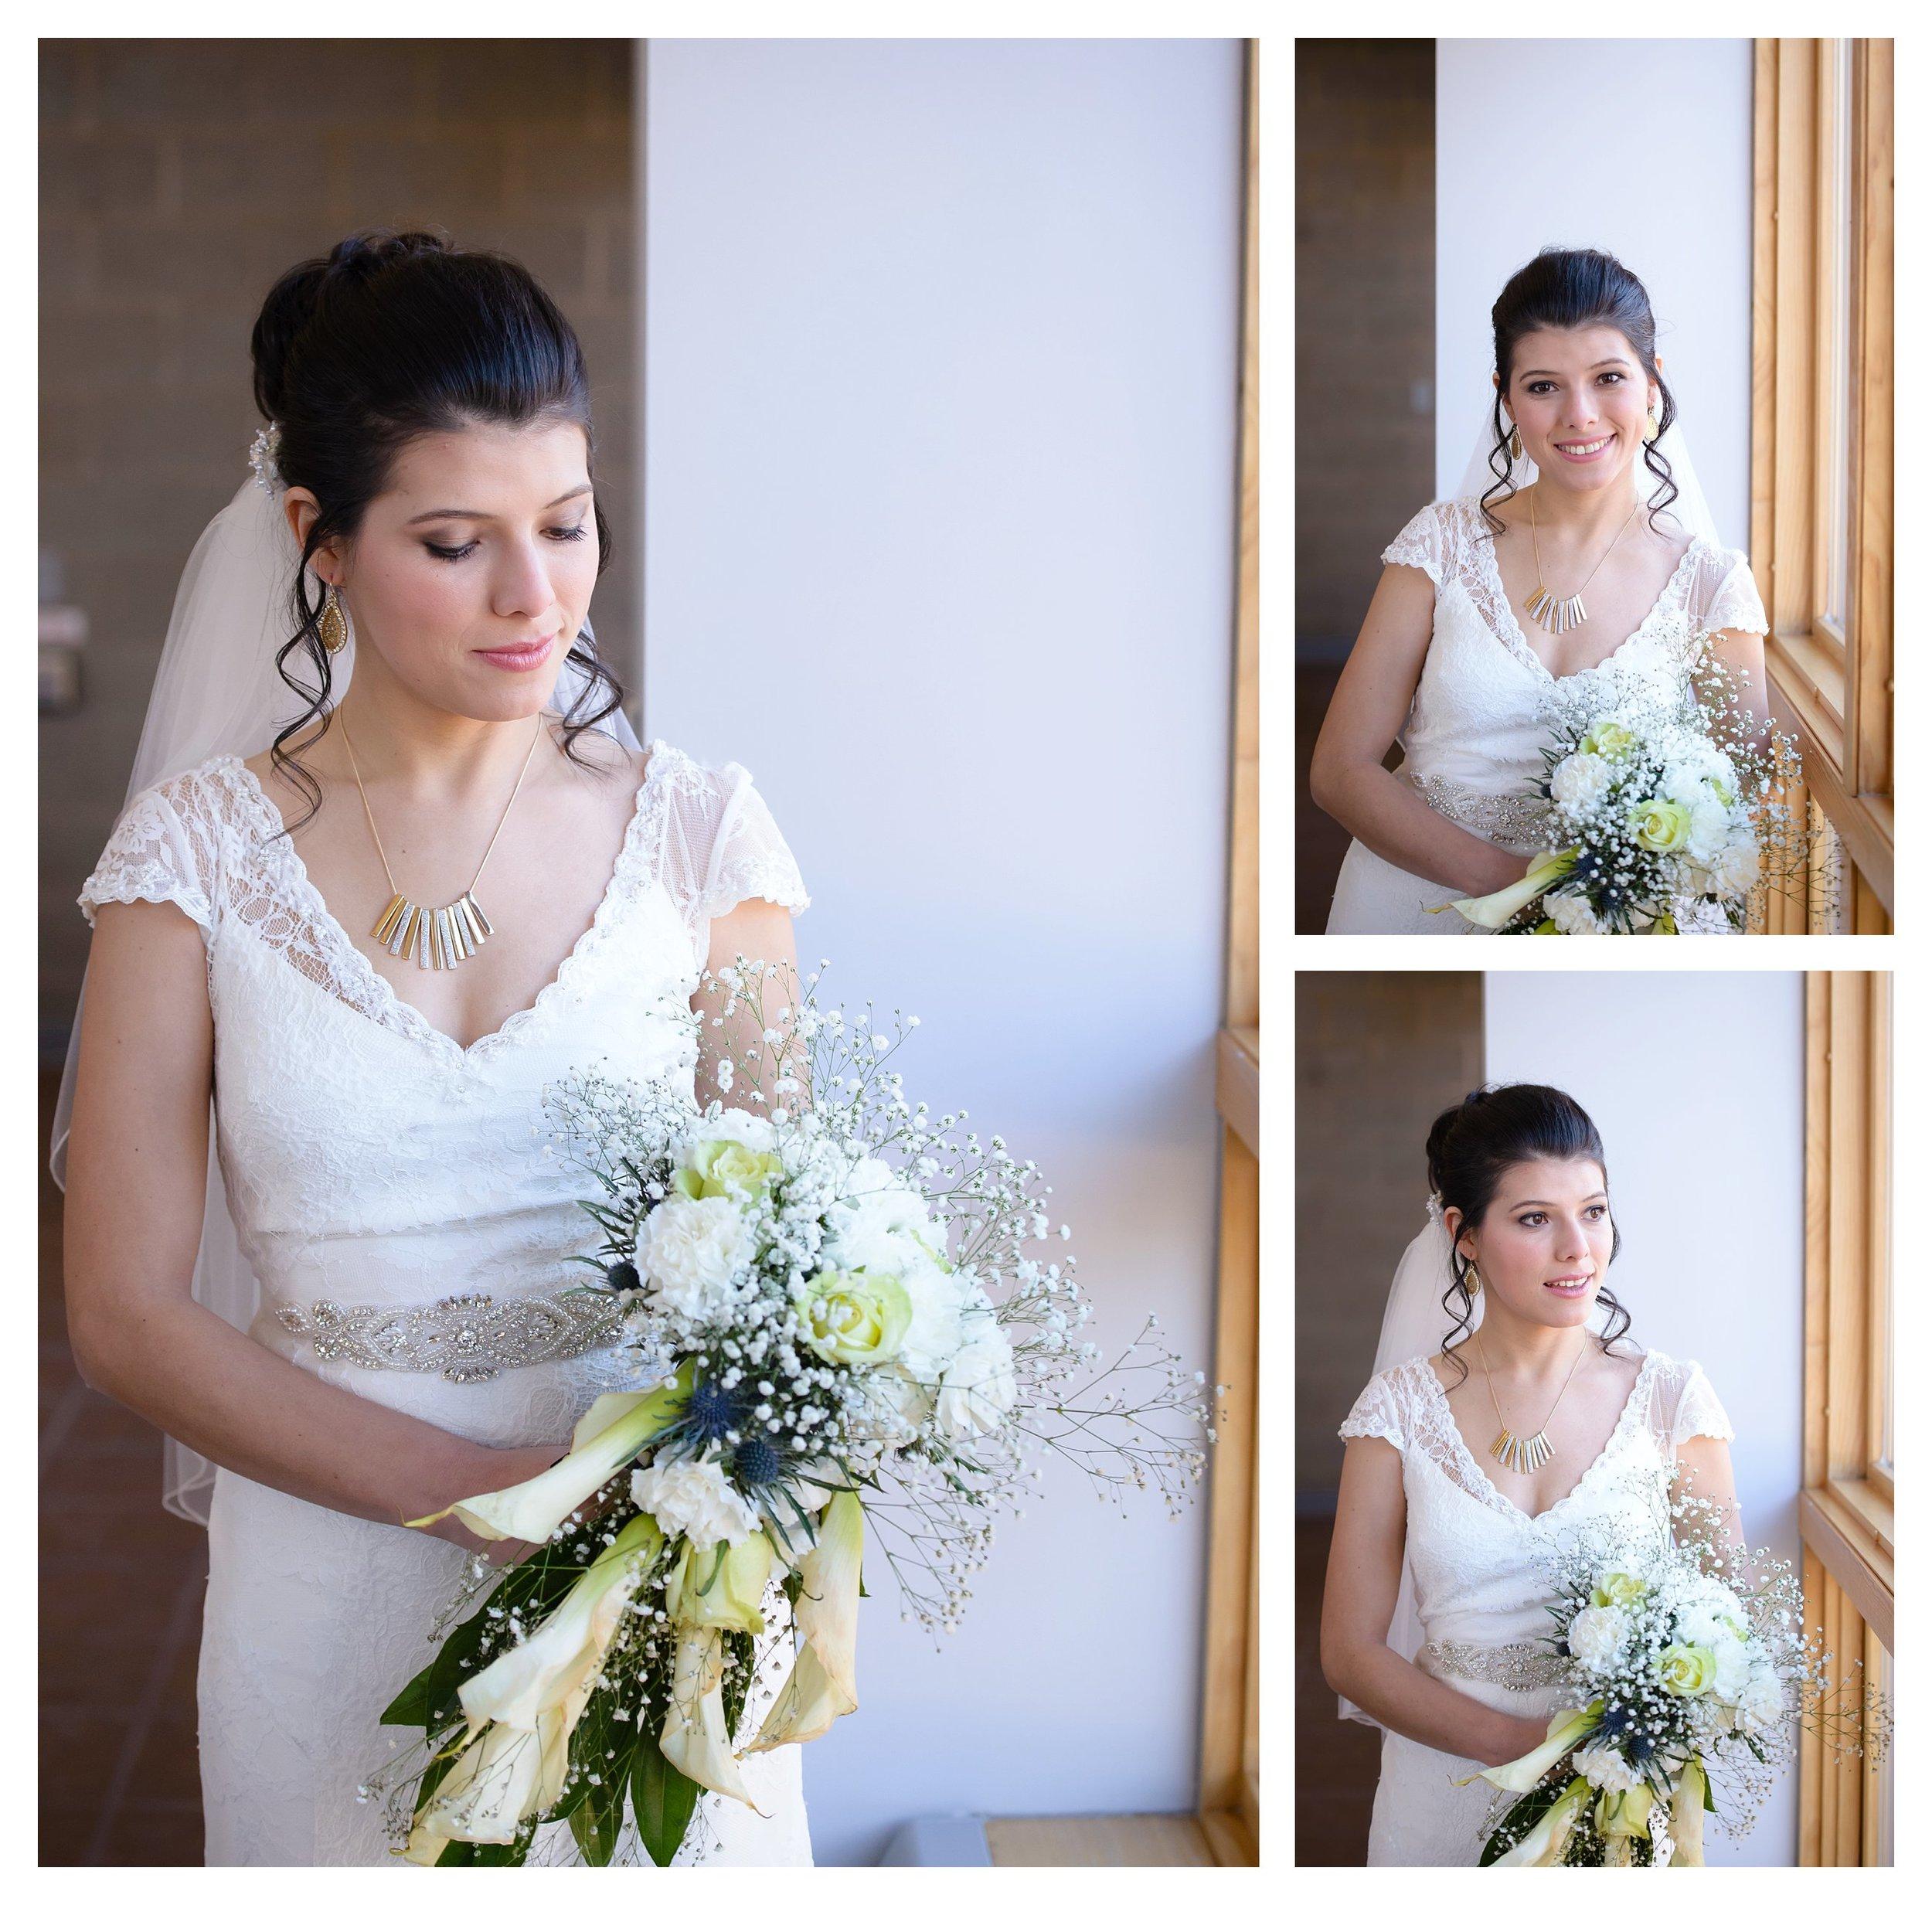 ashland wedding photographer iron river brule wisconsin ps 139 photography jen jensen_0139.jpg